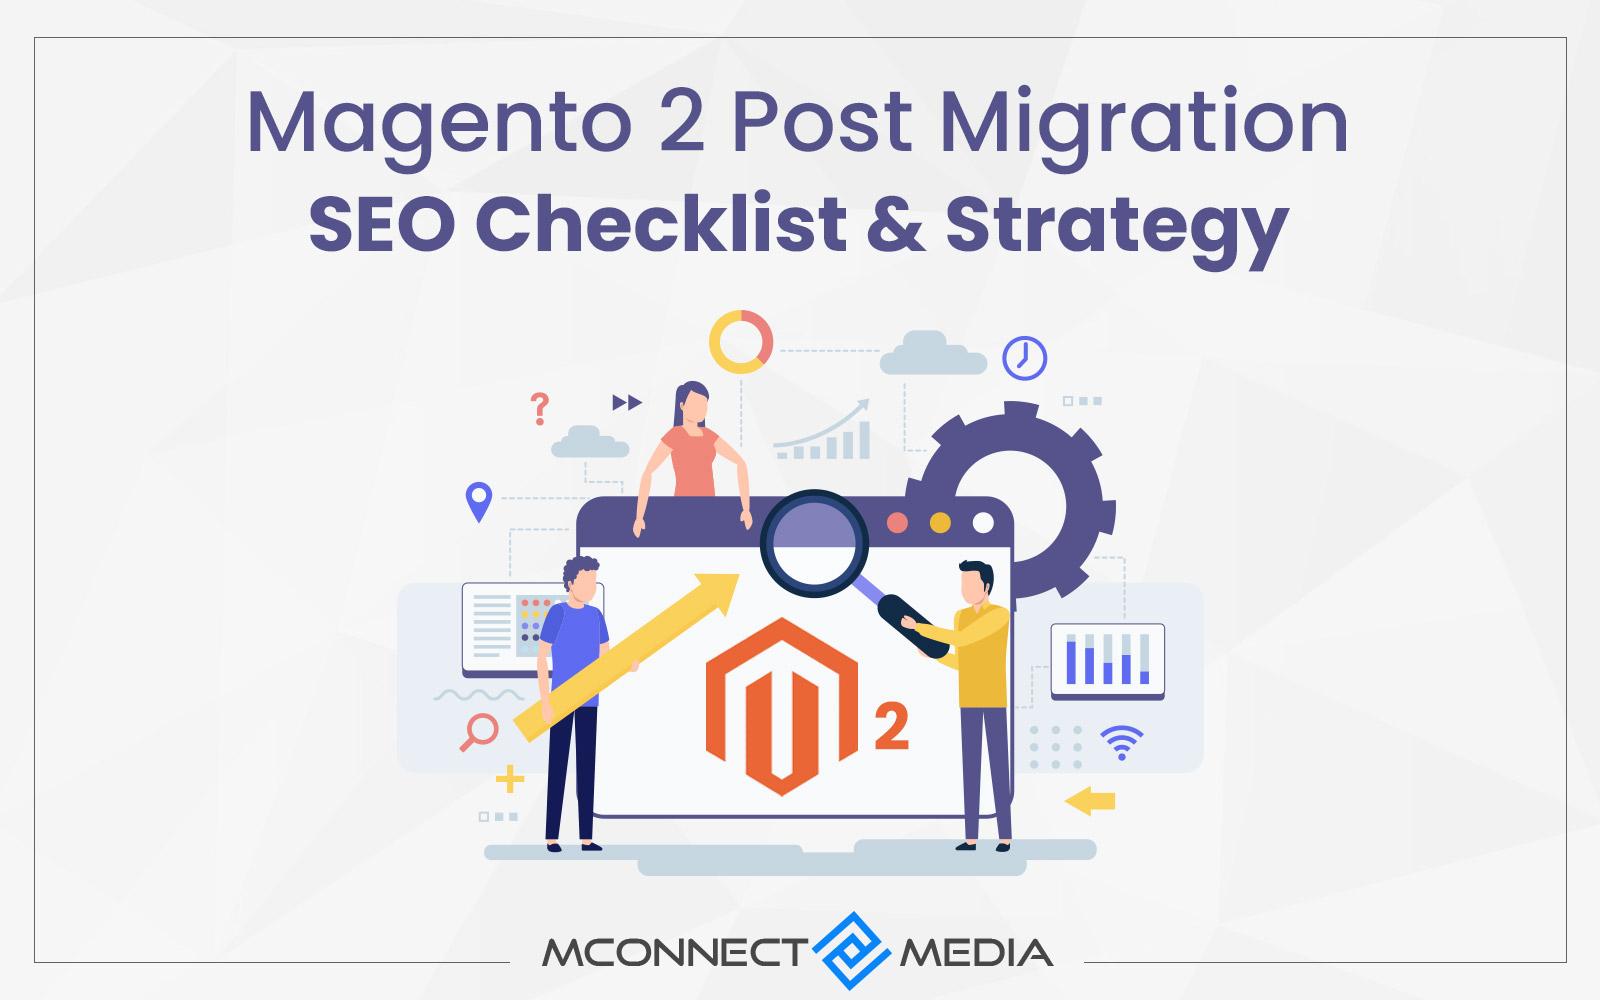 Magento 2 SEO Checklist : Extensive Post Migration Checklist